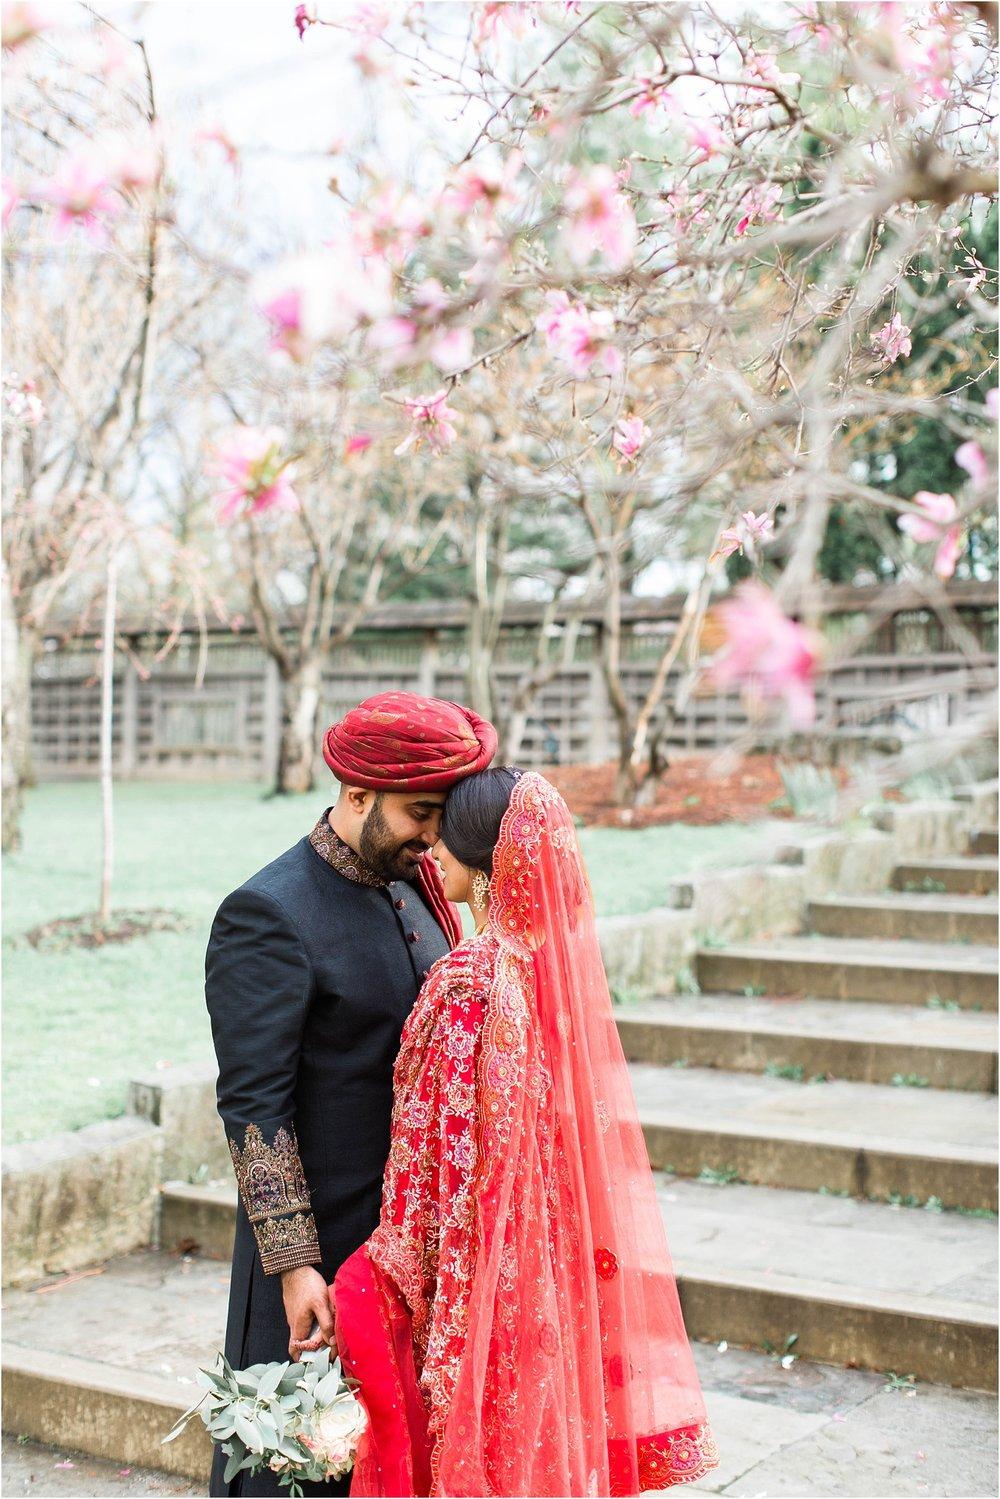 Jame-Masjid-Coopers-Mosque-Kariya-Park-Cherry-Blossoms-Wedding-Toronto-Mississauga-Brampton-Scarborough-GTA-Pakistani-Indian-Wedding-Engagement-Photographer-Photography_0048.jpg